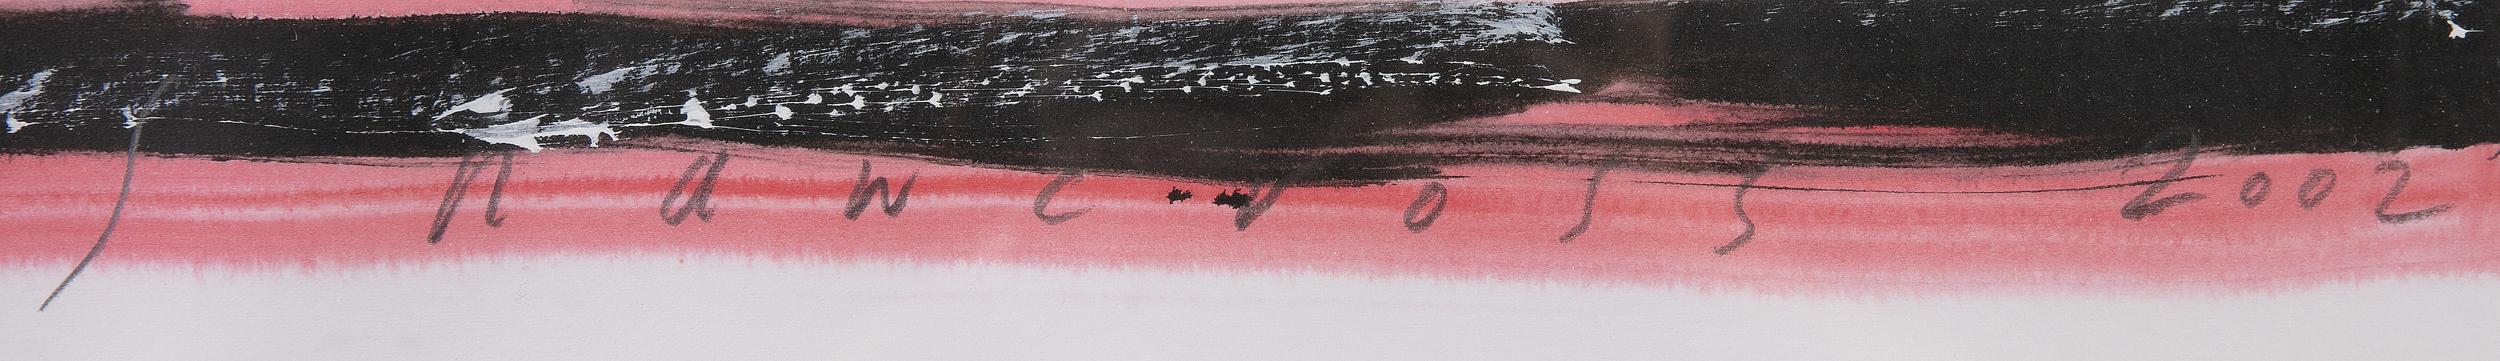 Lot 75 - Neil Shawcross RHA RUA (b.1940)Still LifeMixed media, 73 x 72cm (28¾ x 28¼)Signed and dated 2002